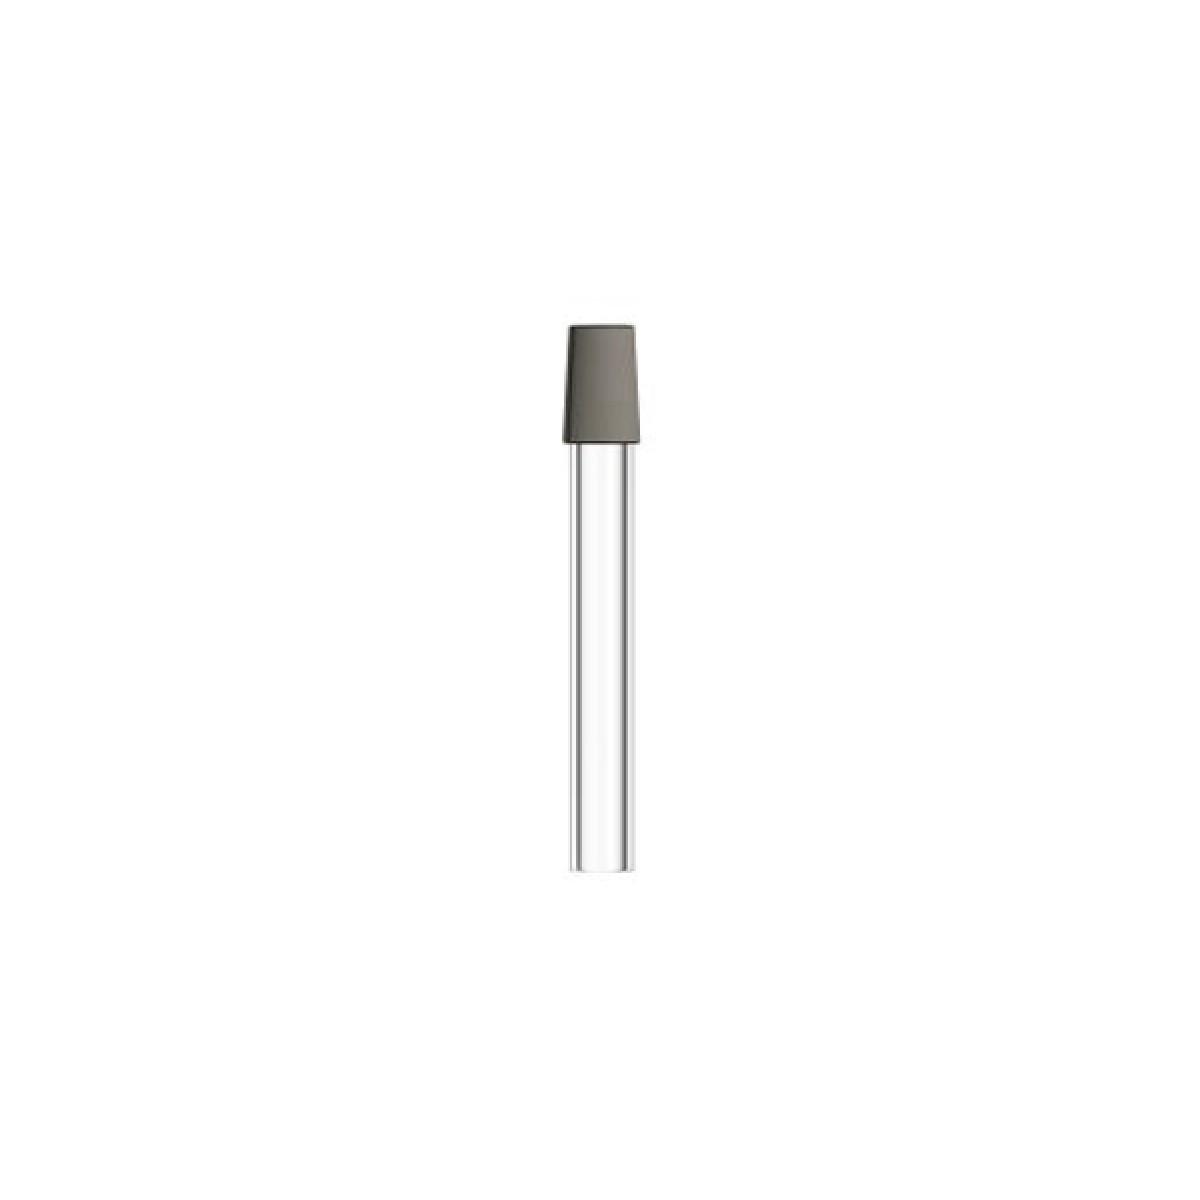 14mm WPA pour vapcap Dynavap (110mm)  - 1